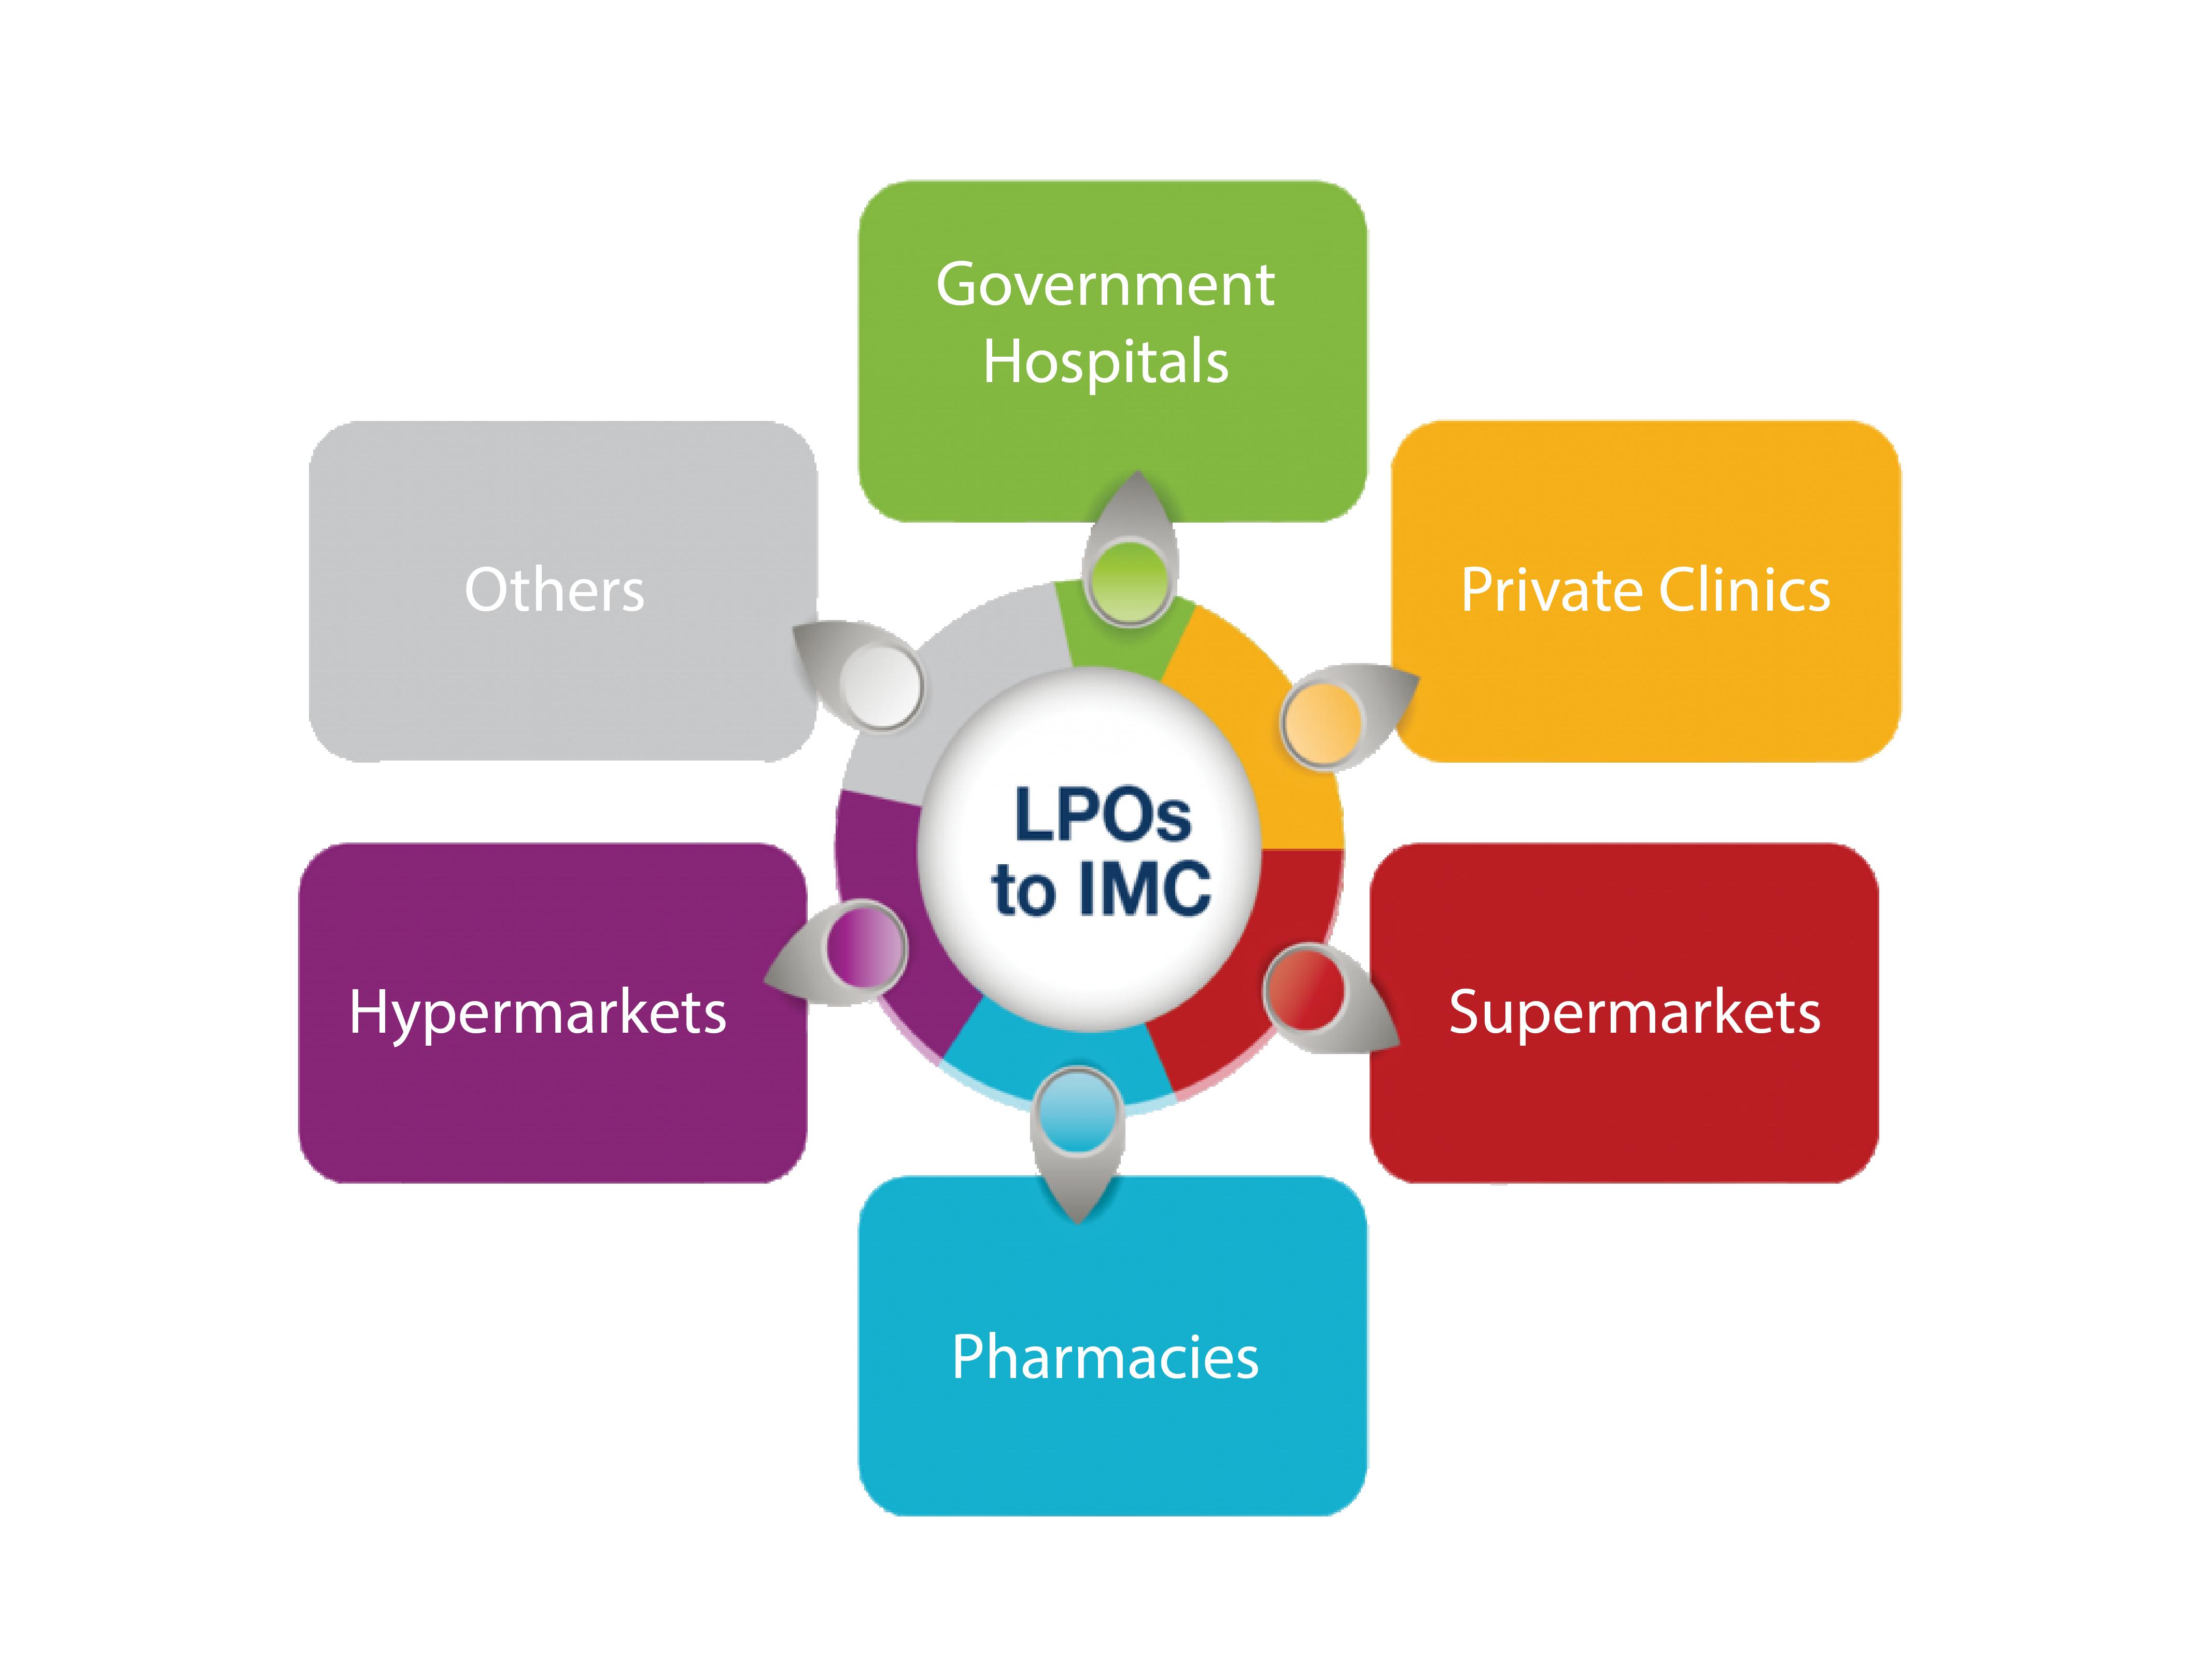 LPOs to IMC